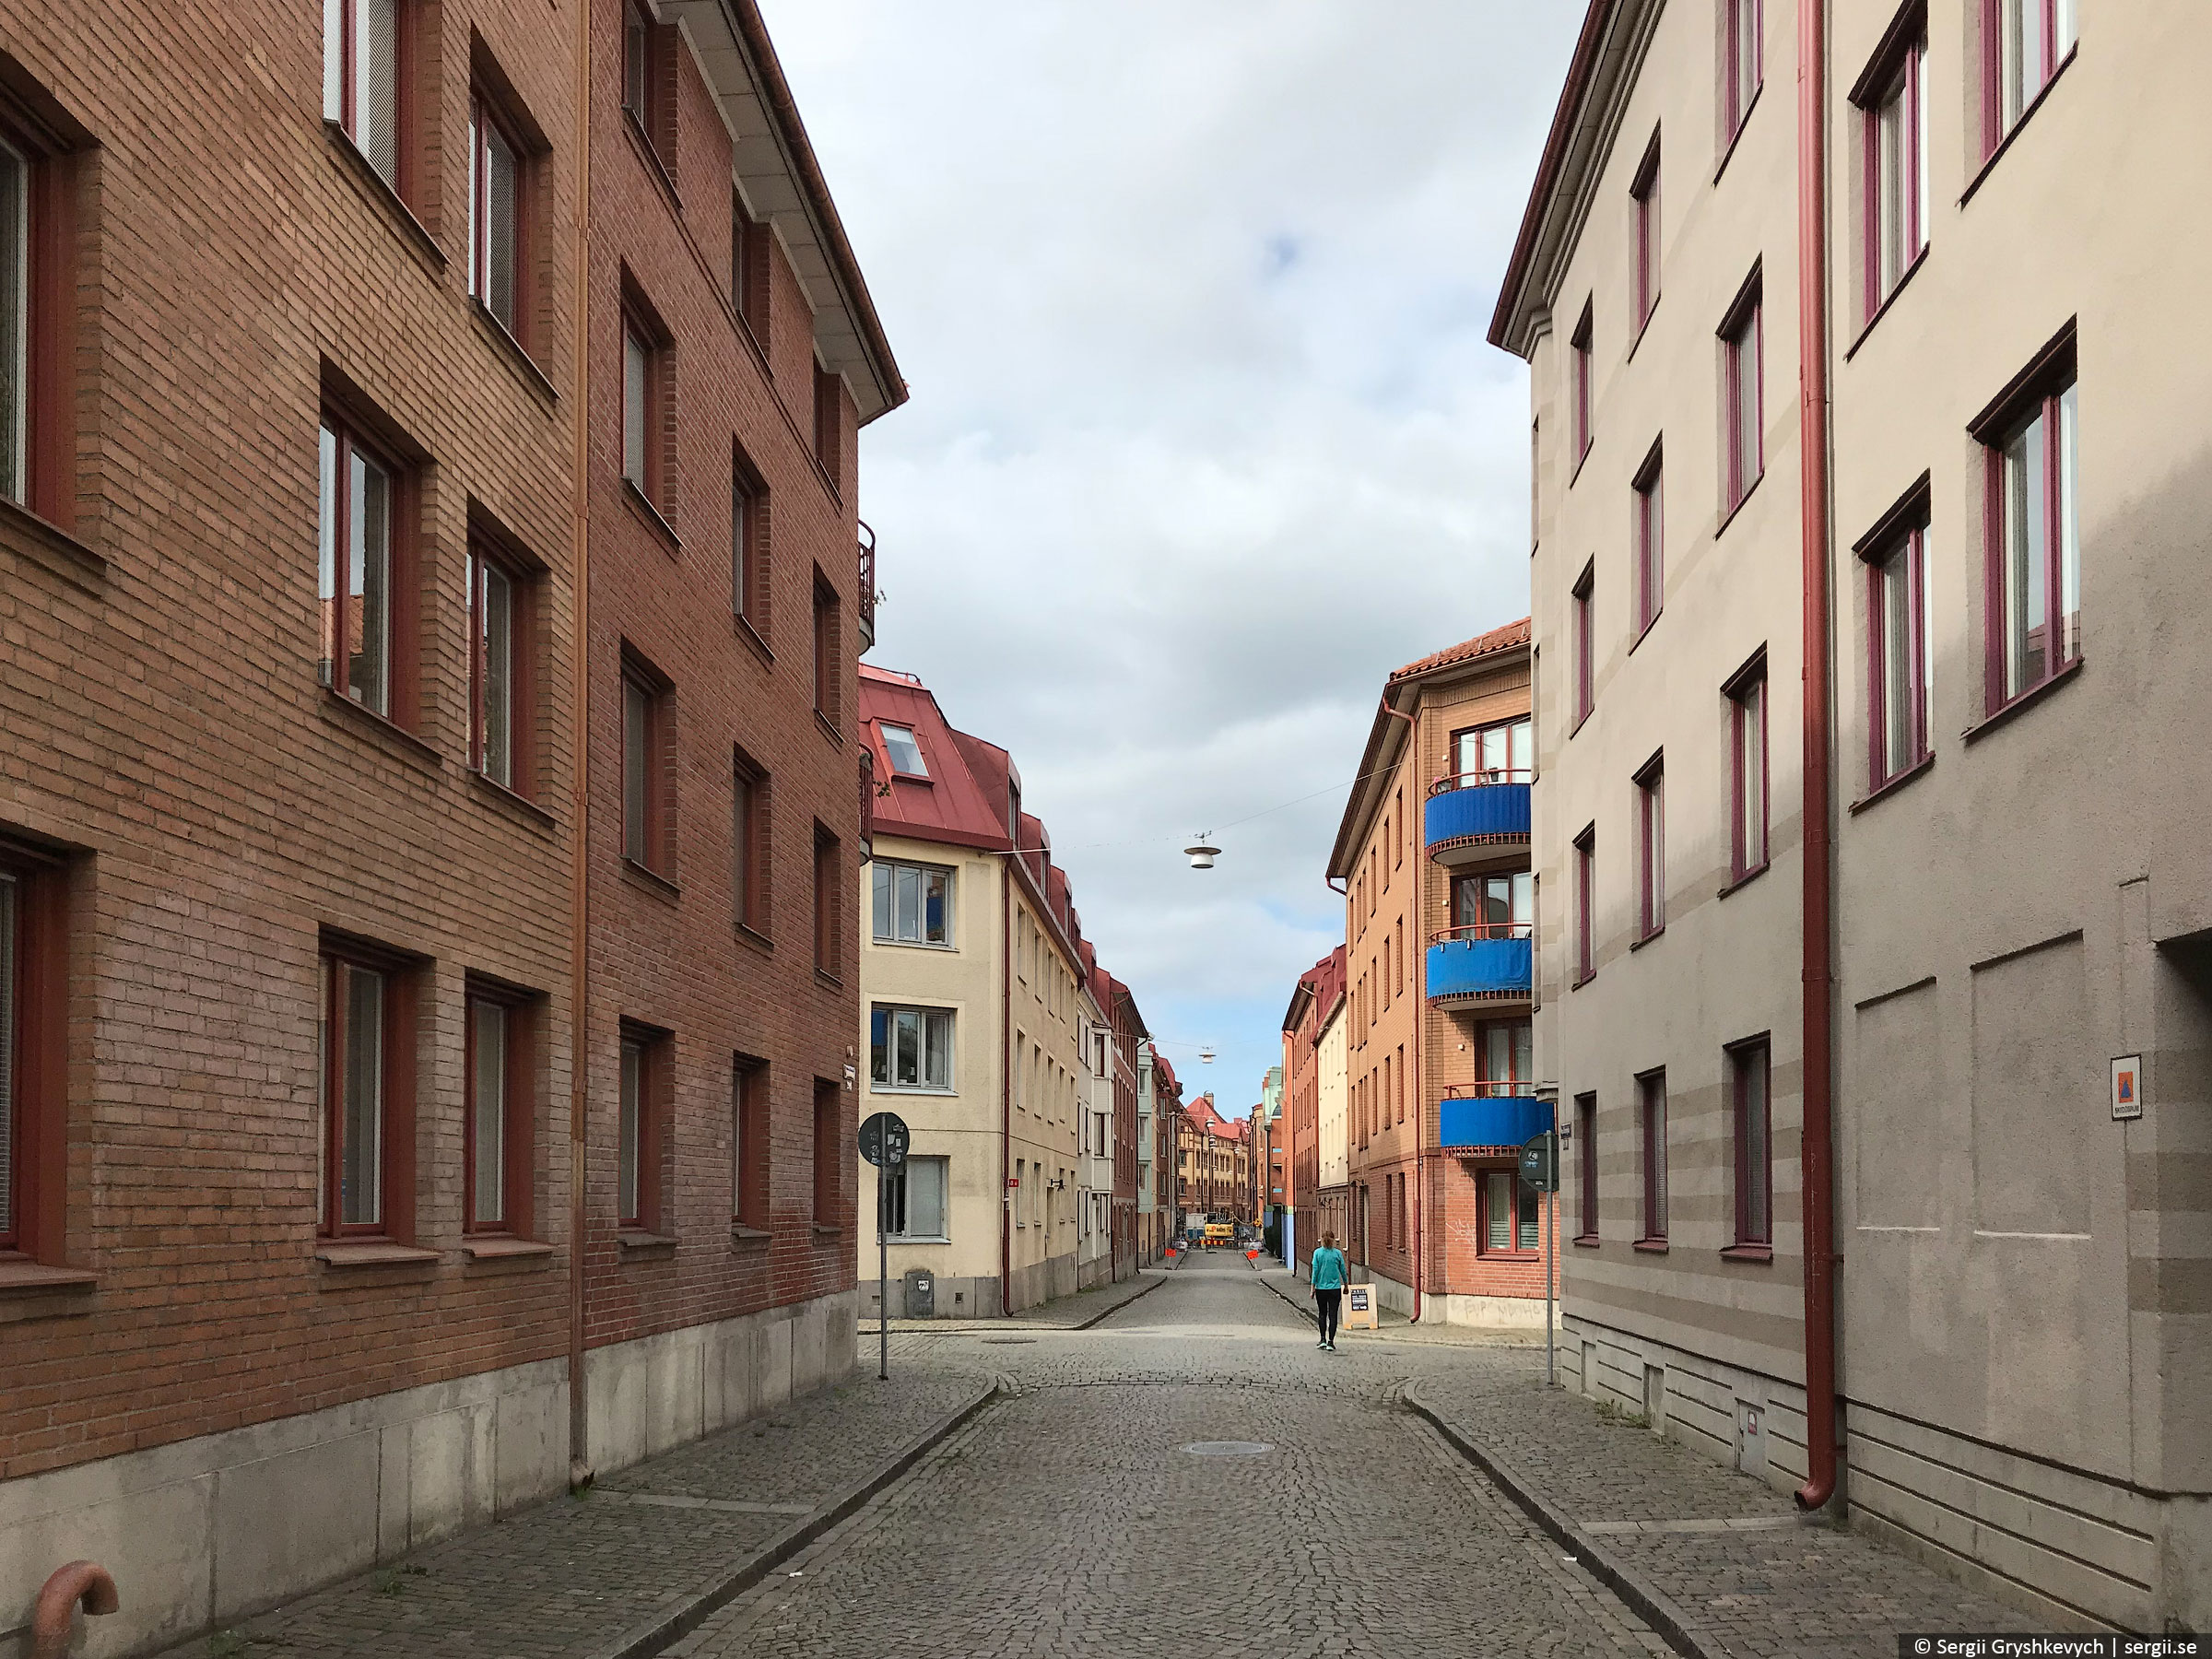 göteborg-ghotenburg-sweden-2018-39